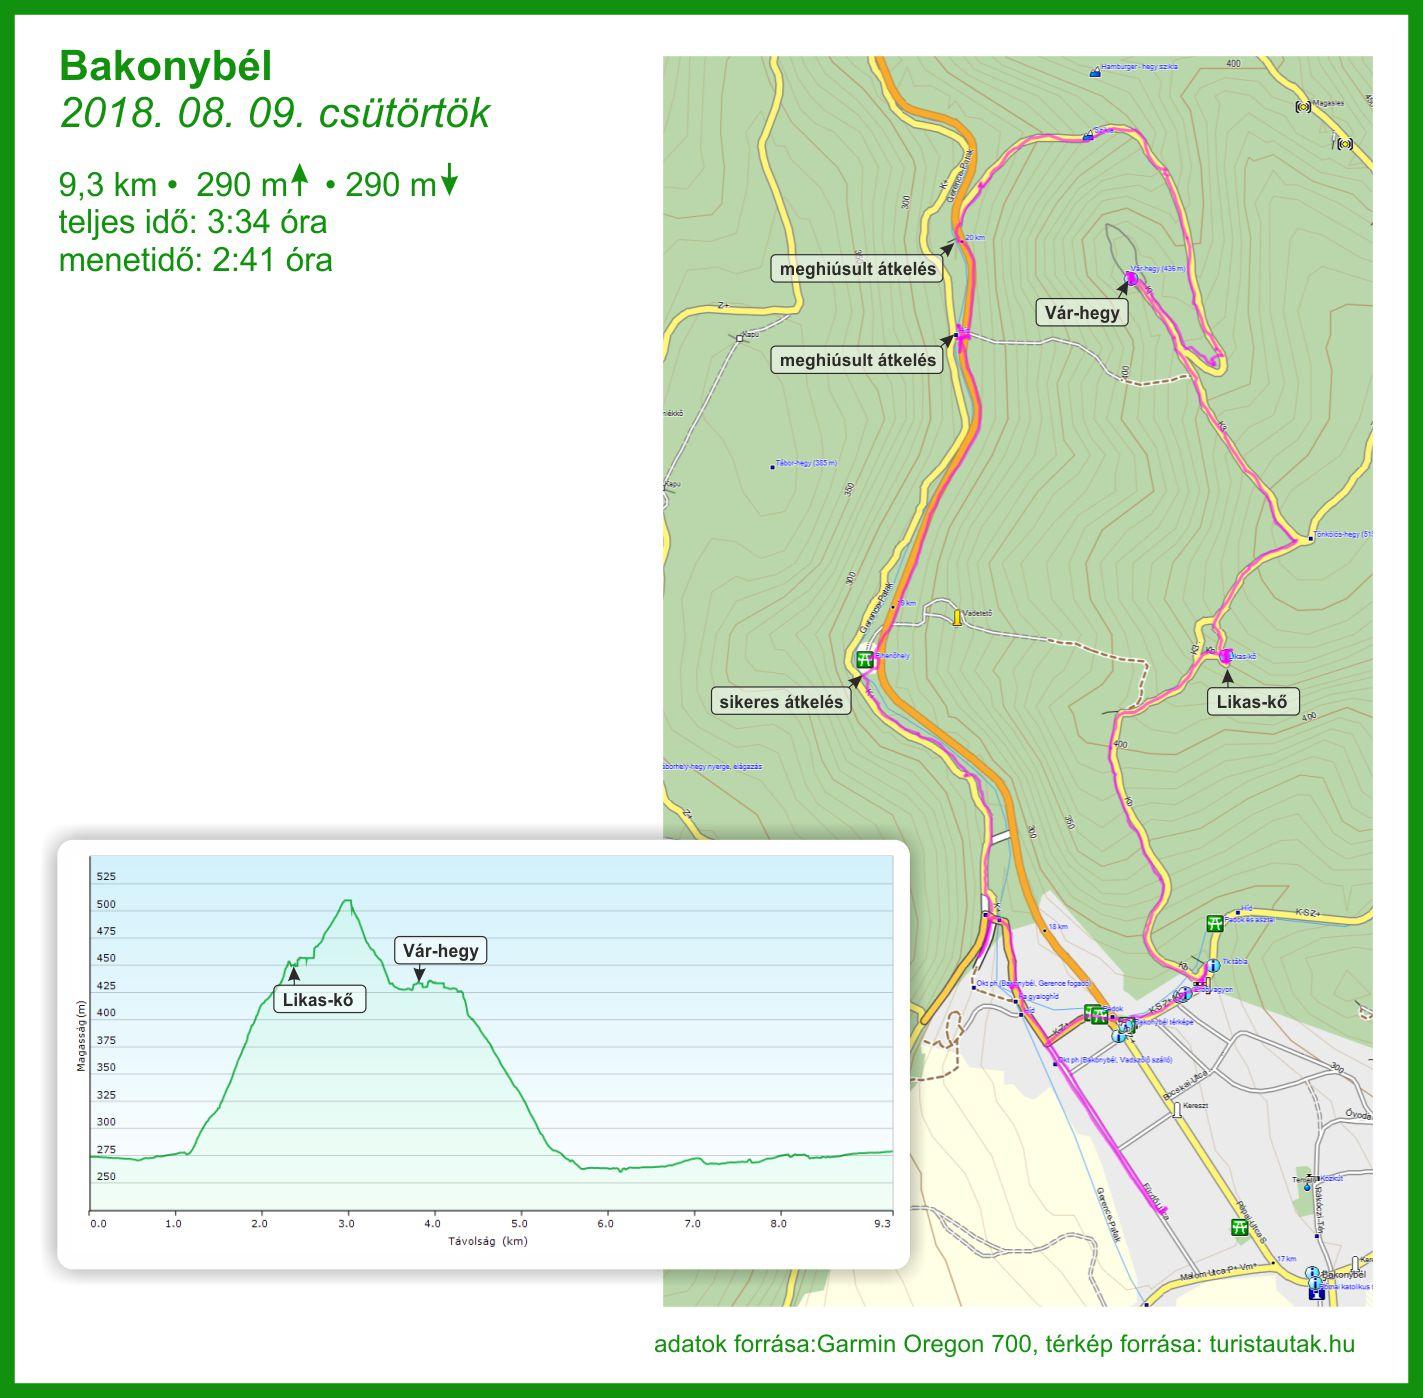 bakonybel_map.jpg